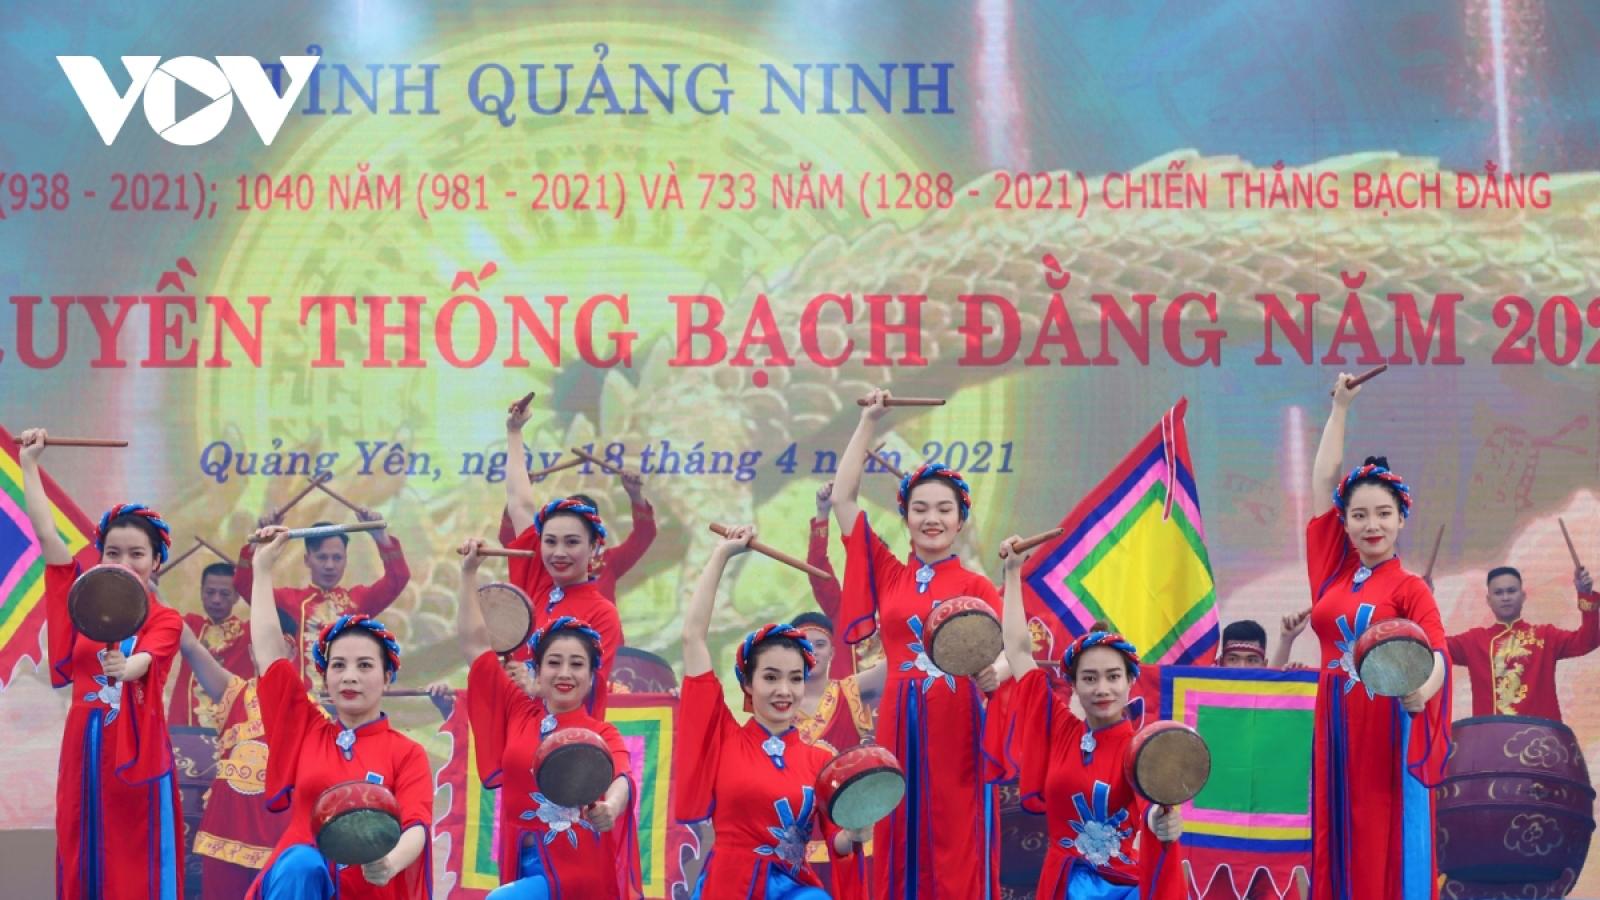 Festival marks 733rd anniversary of Vietnamese victory at Bach Dang river